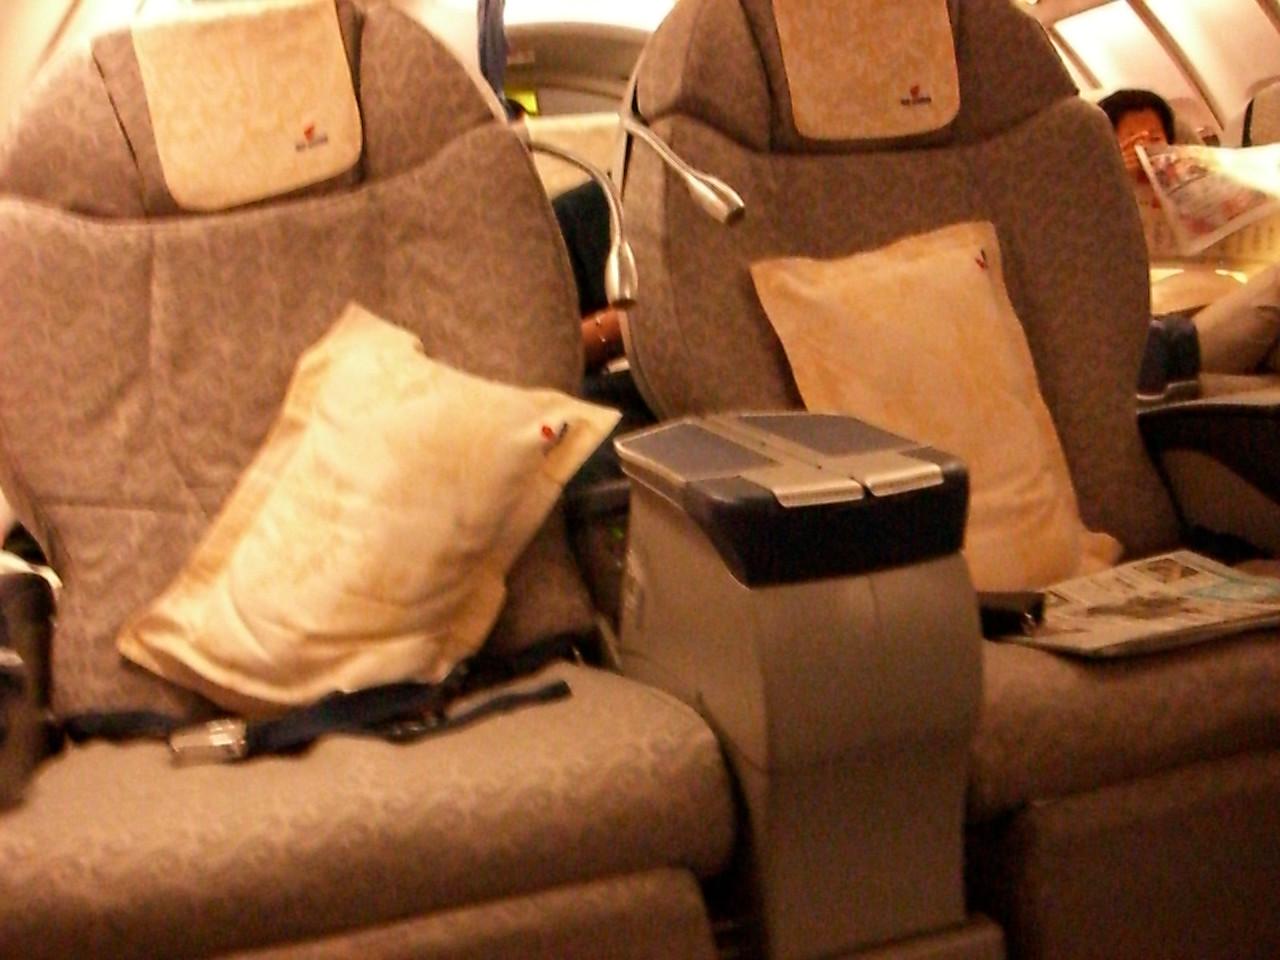 2006 07 13 Thu - Int'l Business Class recliners